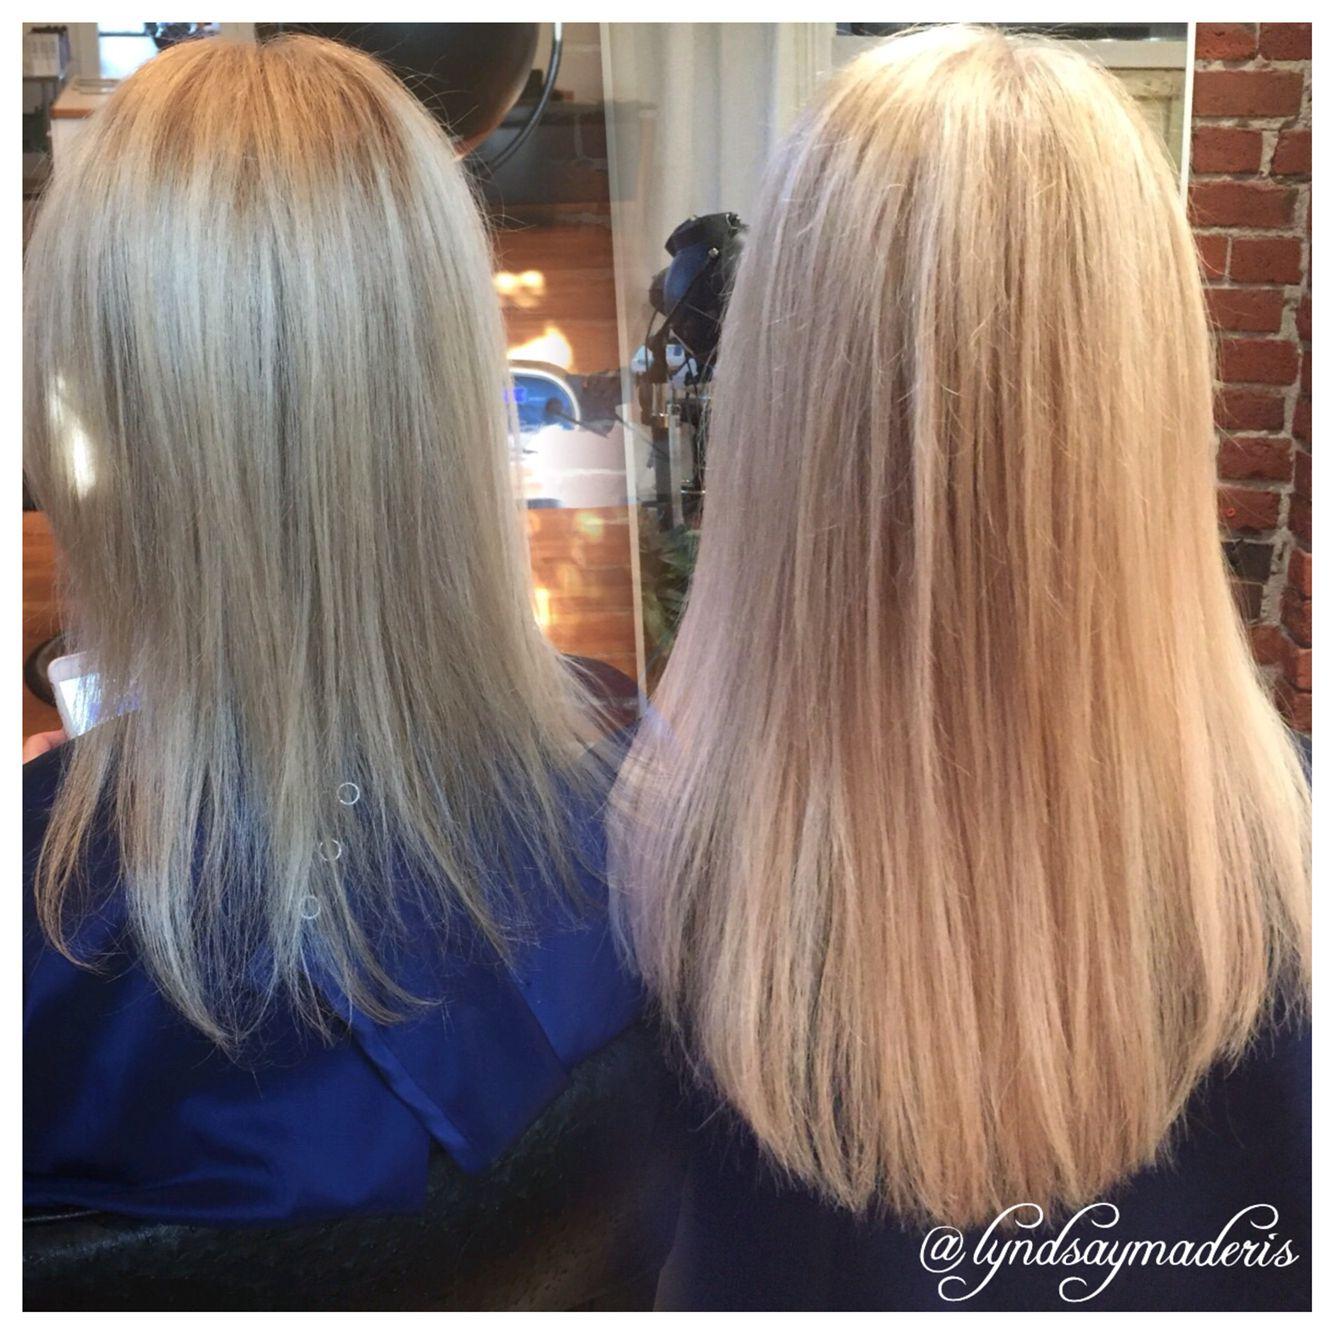 Custom blended blonde great lengths hair extensions by lyndsay custom blended blonde great lengths hair extensions by lyndsay maderis 503686 3261 pmusecretfo Choice Image